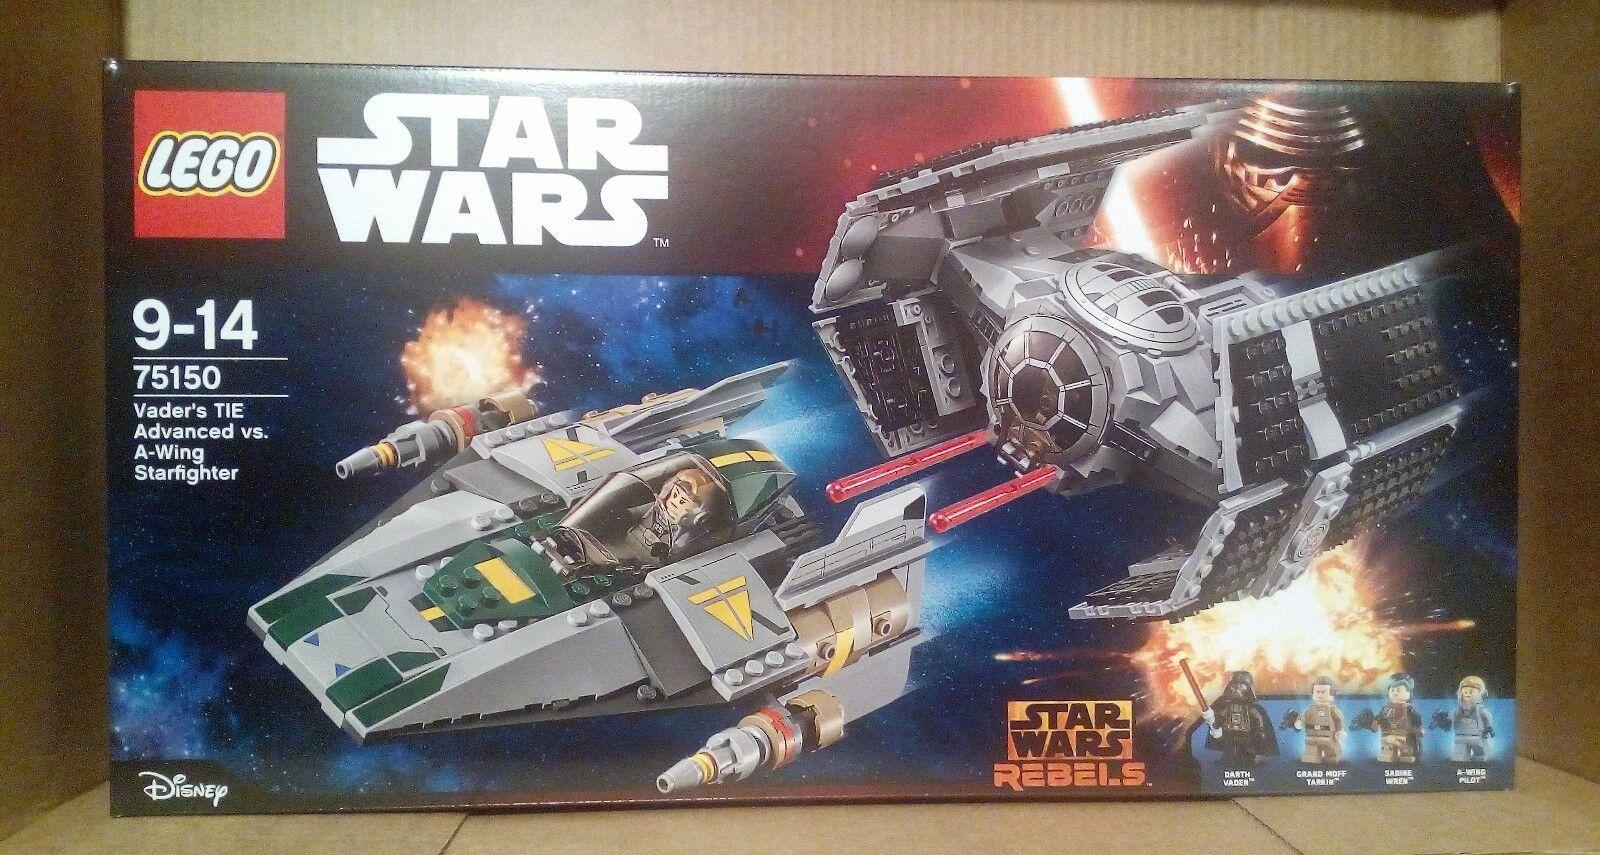 LEGO STAR WARS 75150 Vader Tie Tie Tie Advanced VS Wing Starfighter-NUOVO SIGILLATO-MISB 2003f5